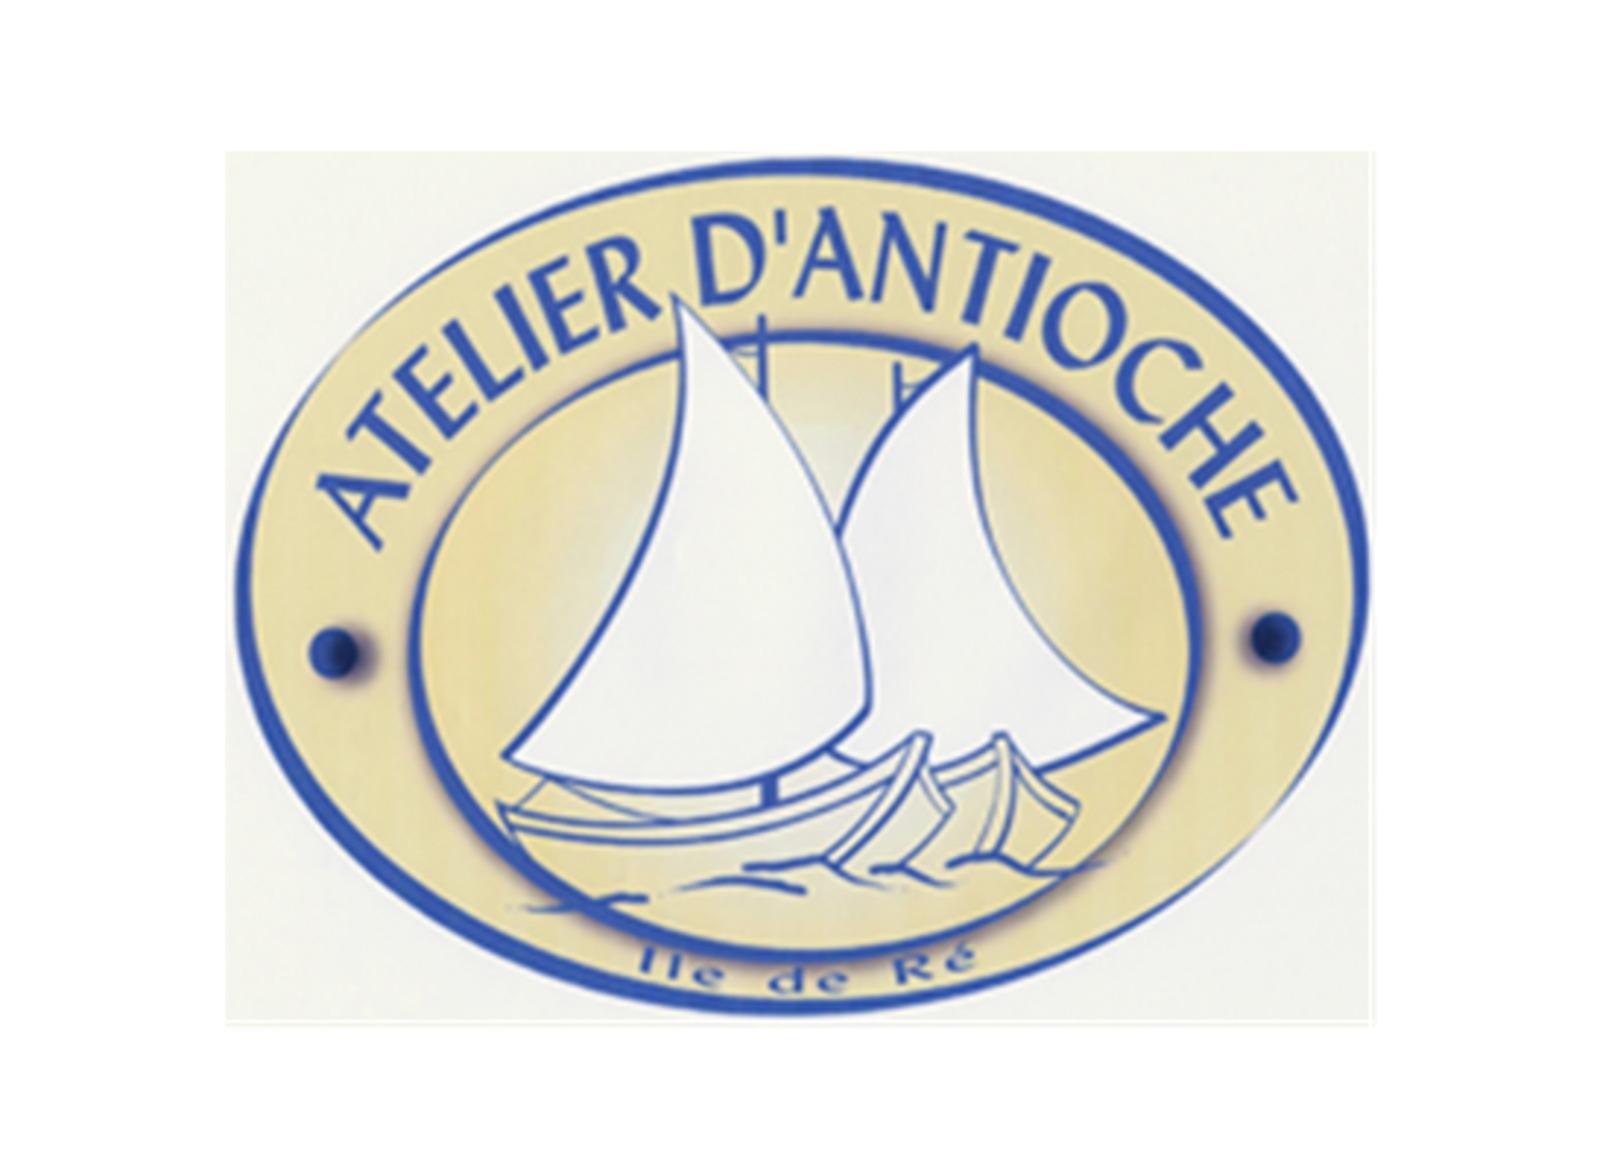 ATELIER D'ANTIOCHE